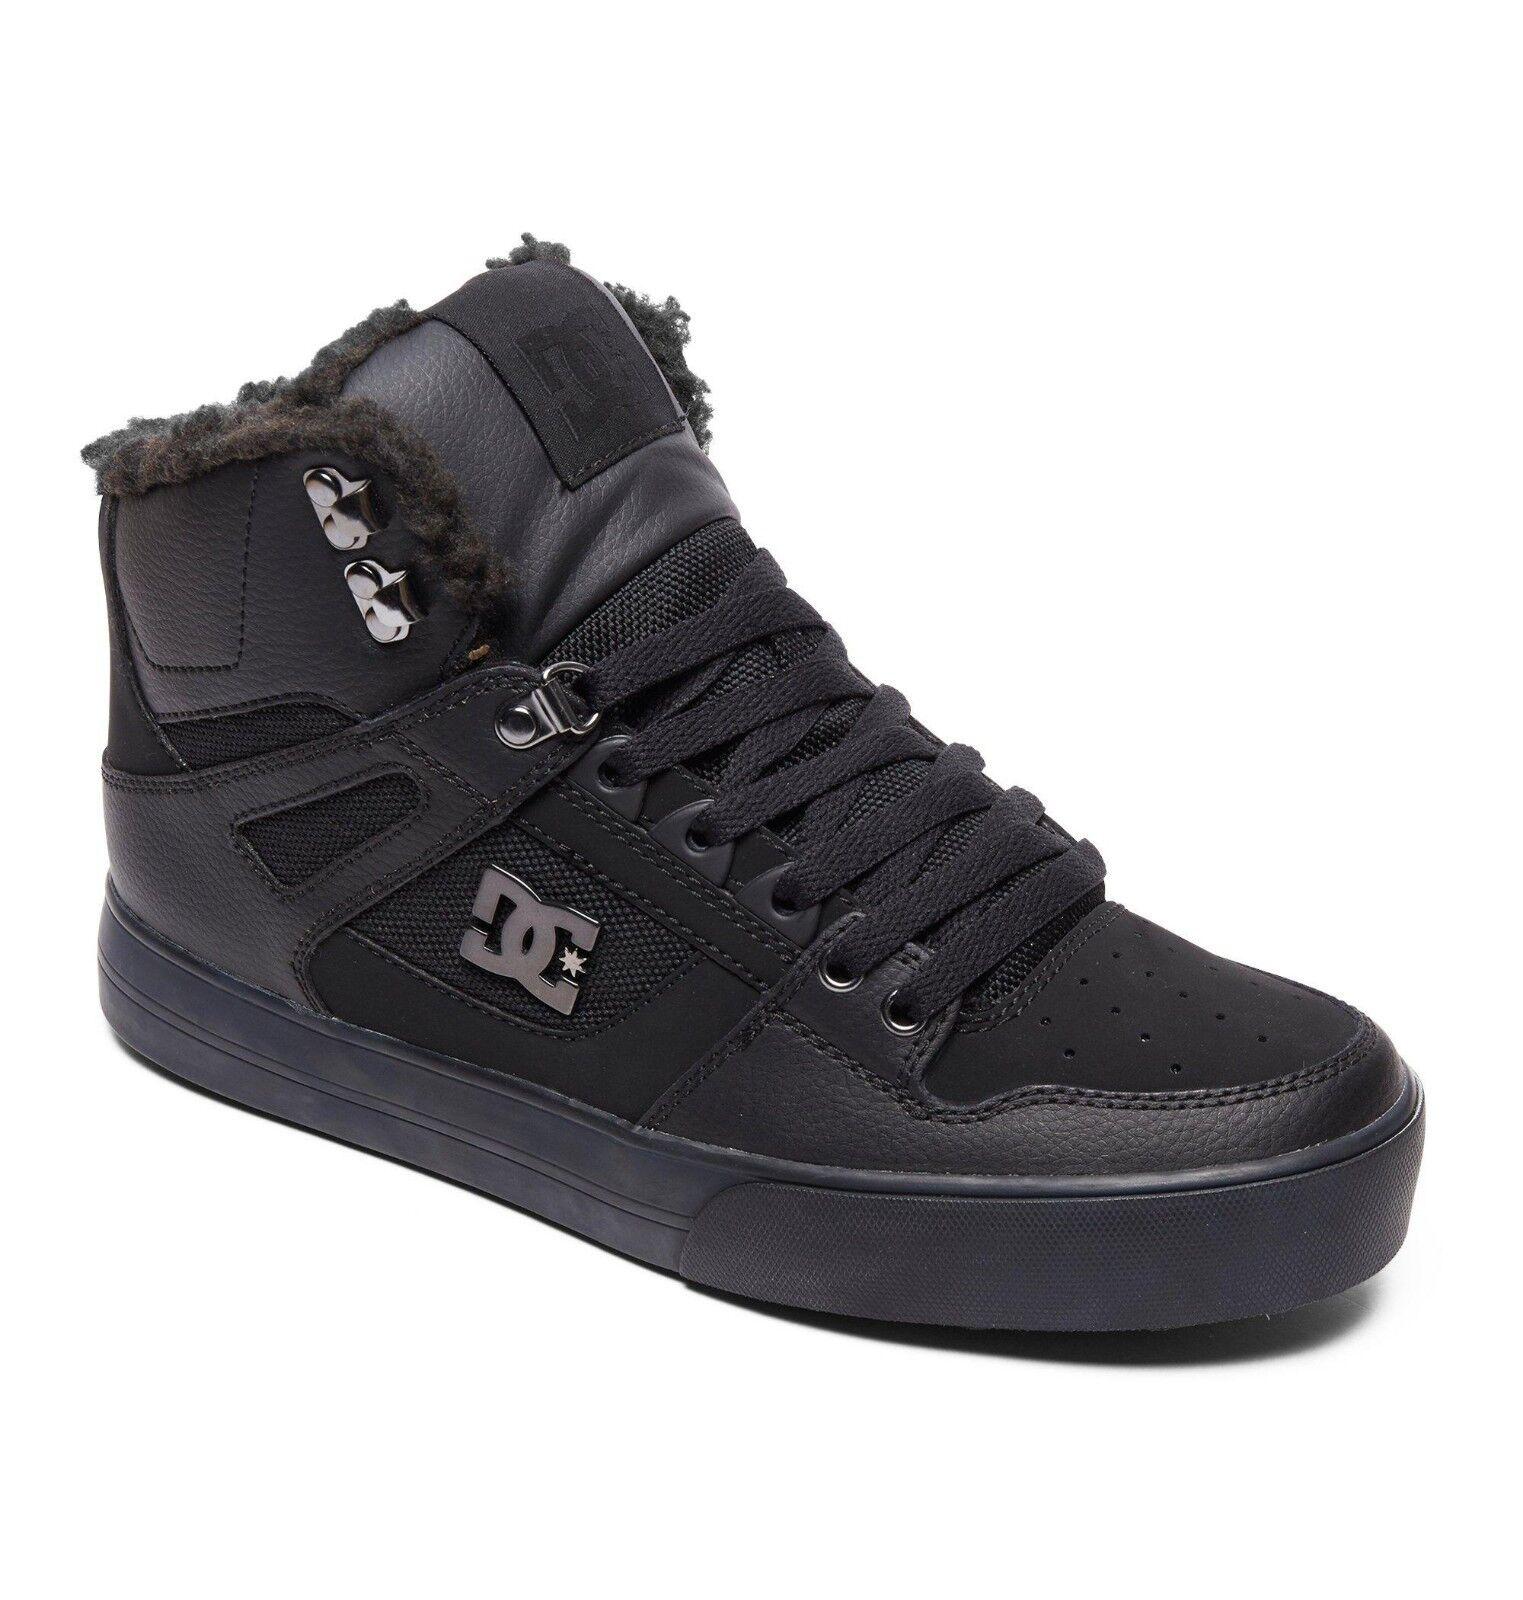 DC Spartan High WC WNT Men/'s Size 11 Black Armor BMX MOTO Skate Shoes Sneakers